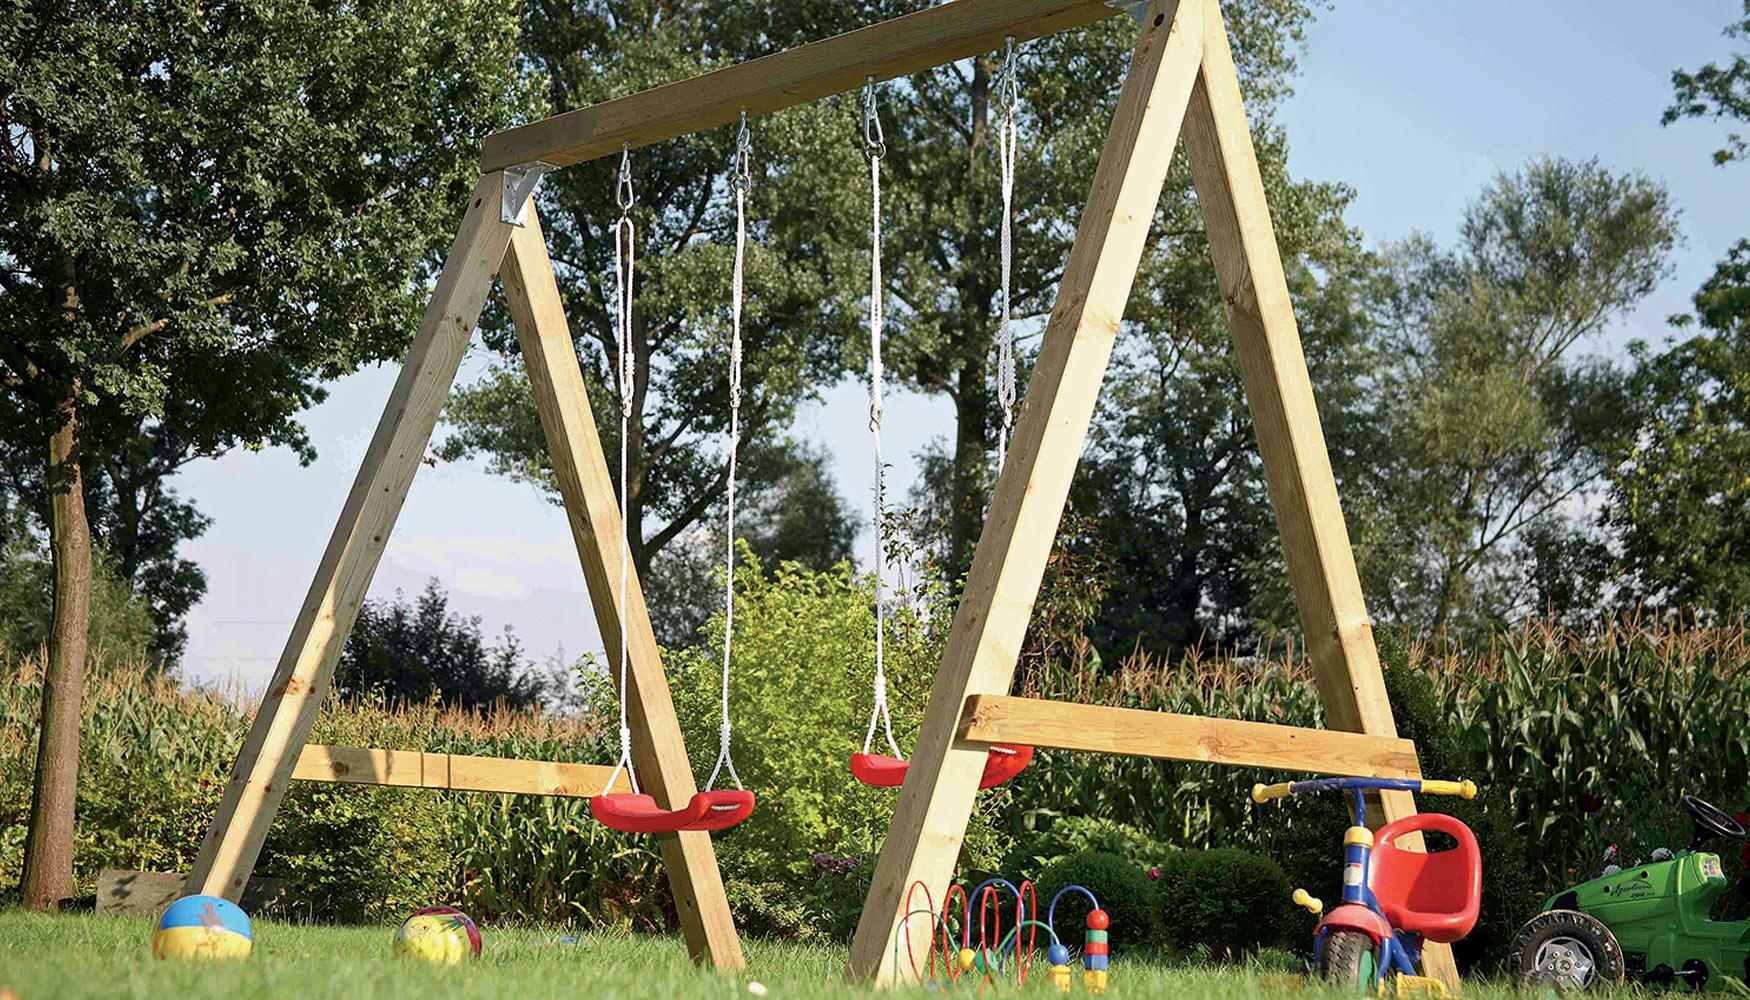 Como hacer columpios de madera good como hacer columpios - Columpios de madera ...